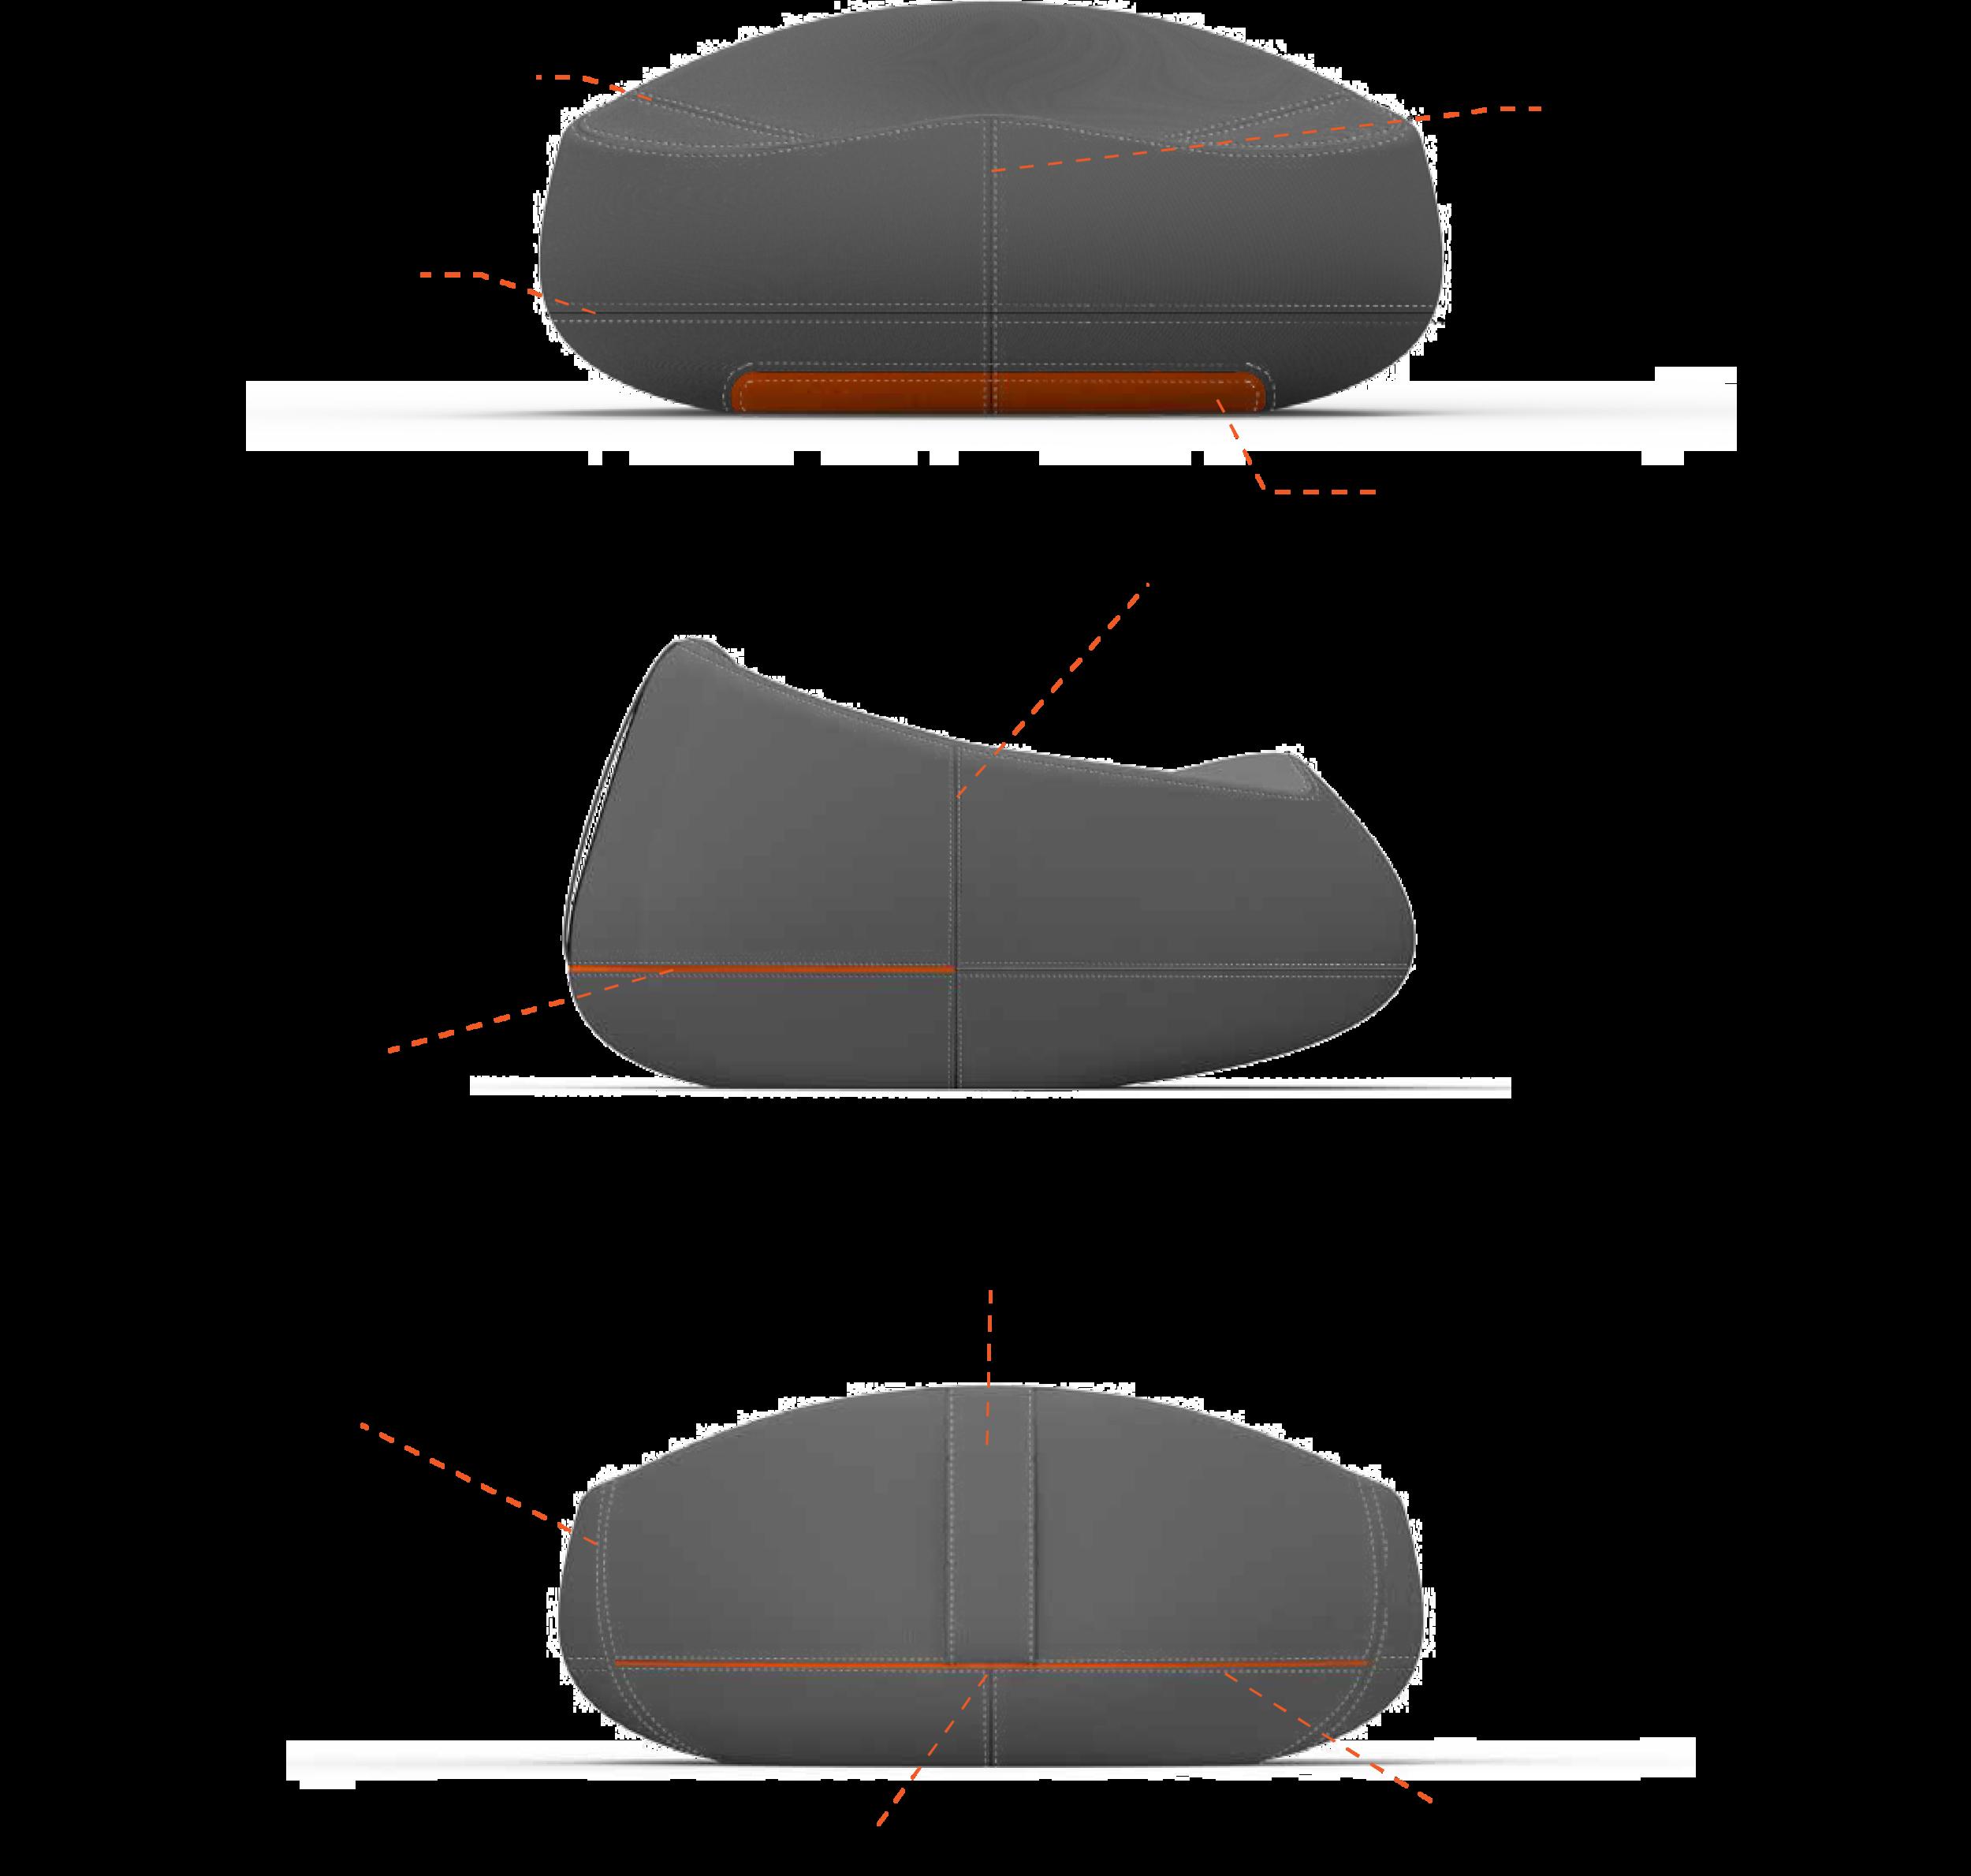 Figure 2. High Resolution Render.